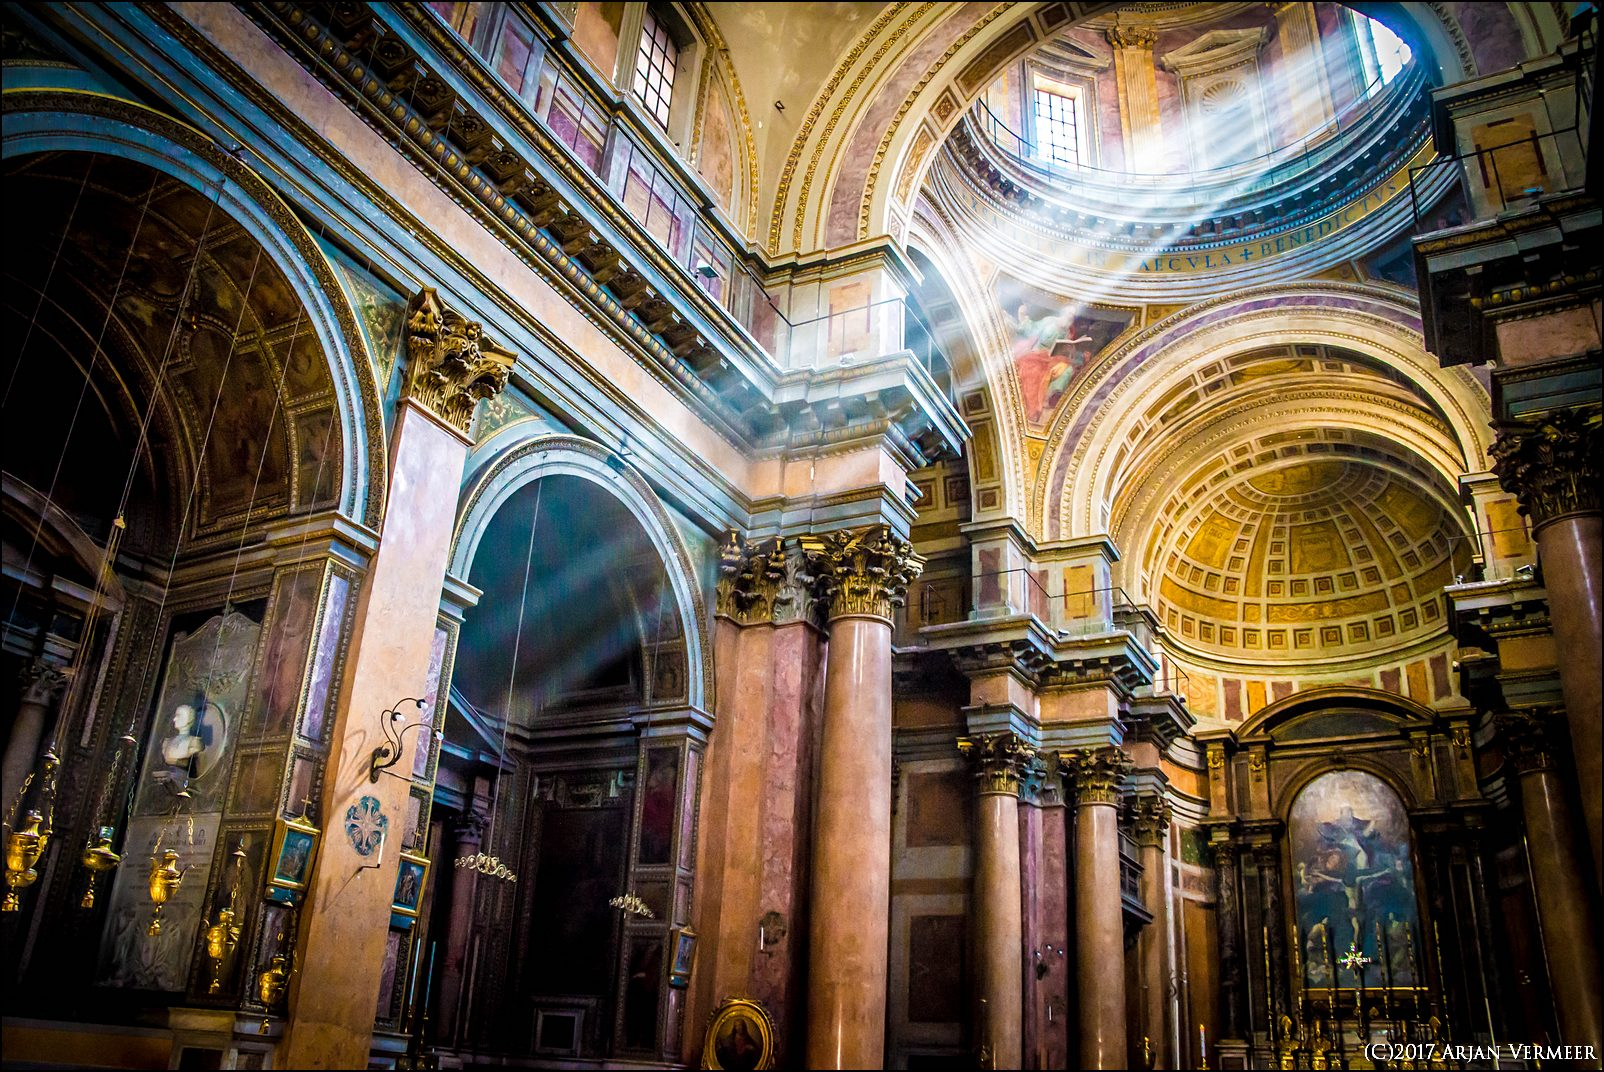 Licht in de Kerk/ Shine a light in Church